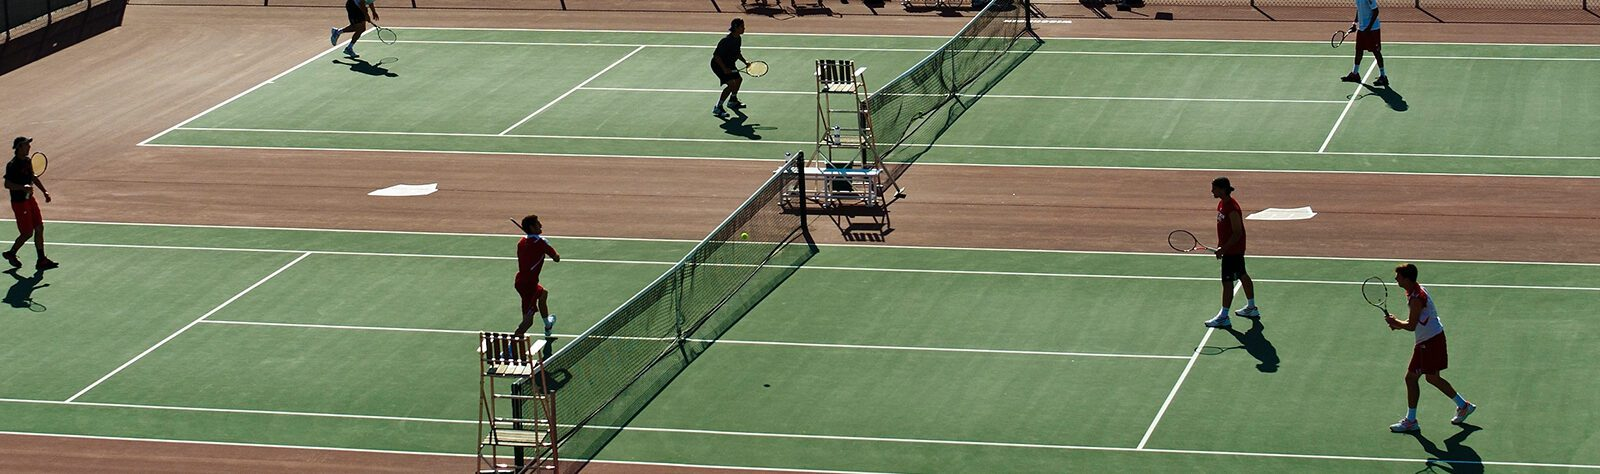 people playing tennis on UW–Madison campus